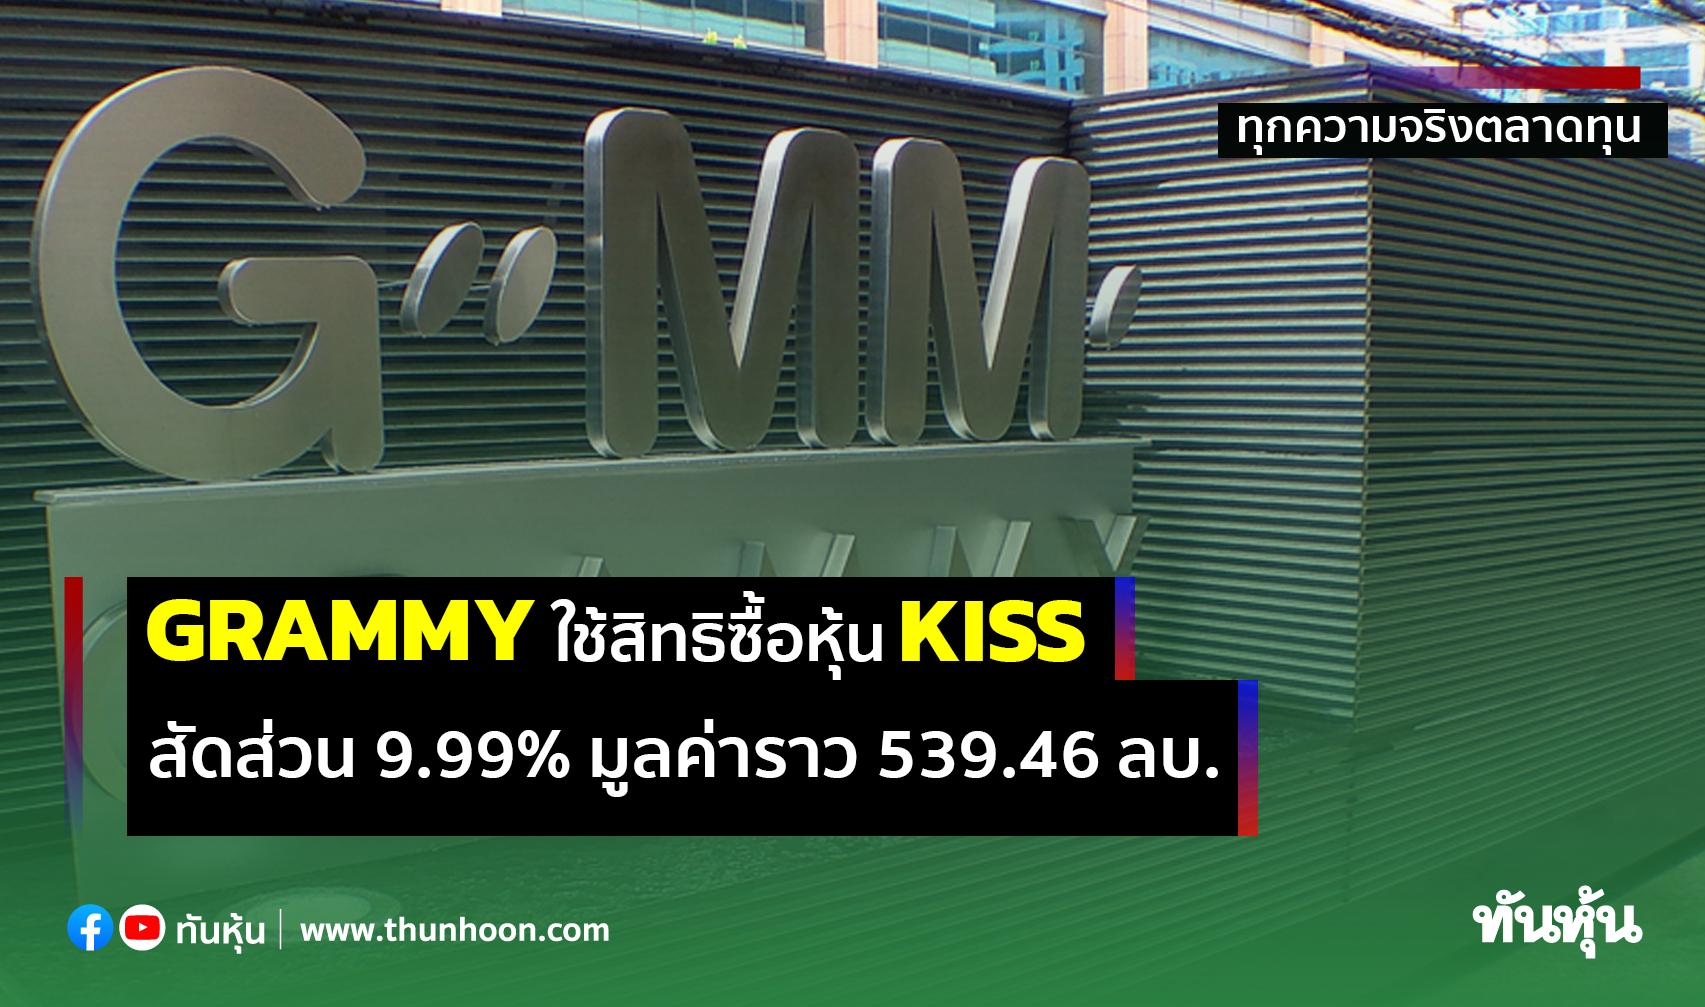 GRAMMY ใช้สิทธิซื้อหุ้น KISS สัดส่วน 9.99% มูลค่าราว 539.46 ลบ.